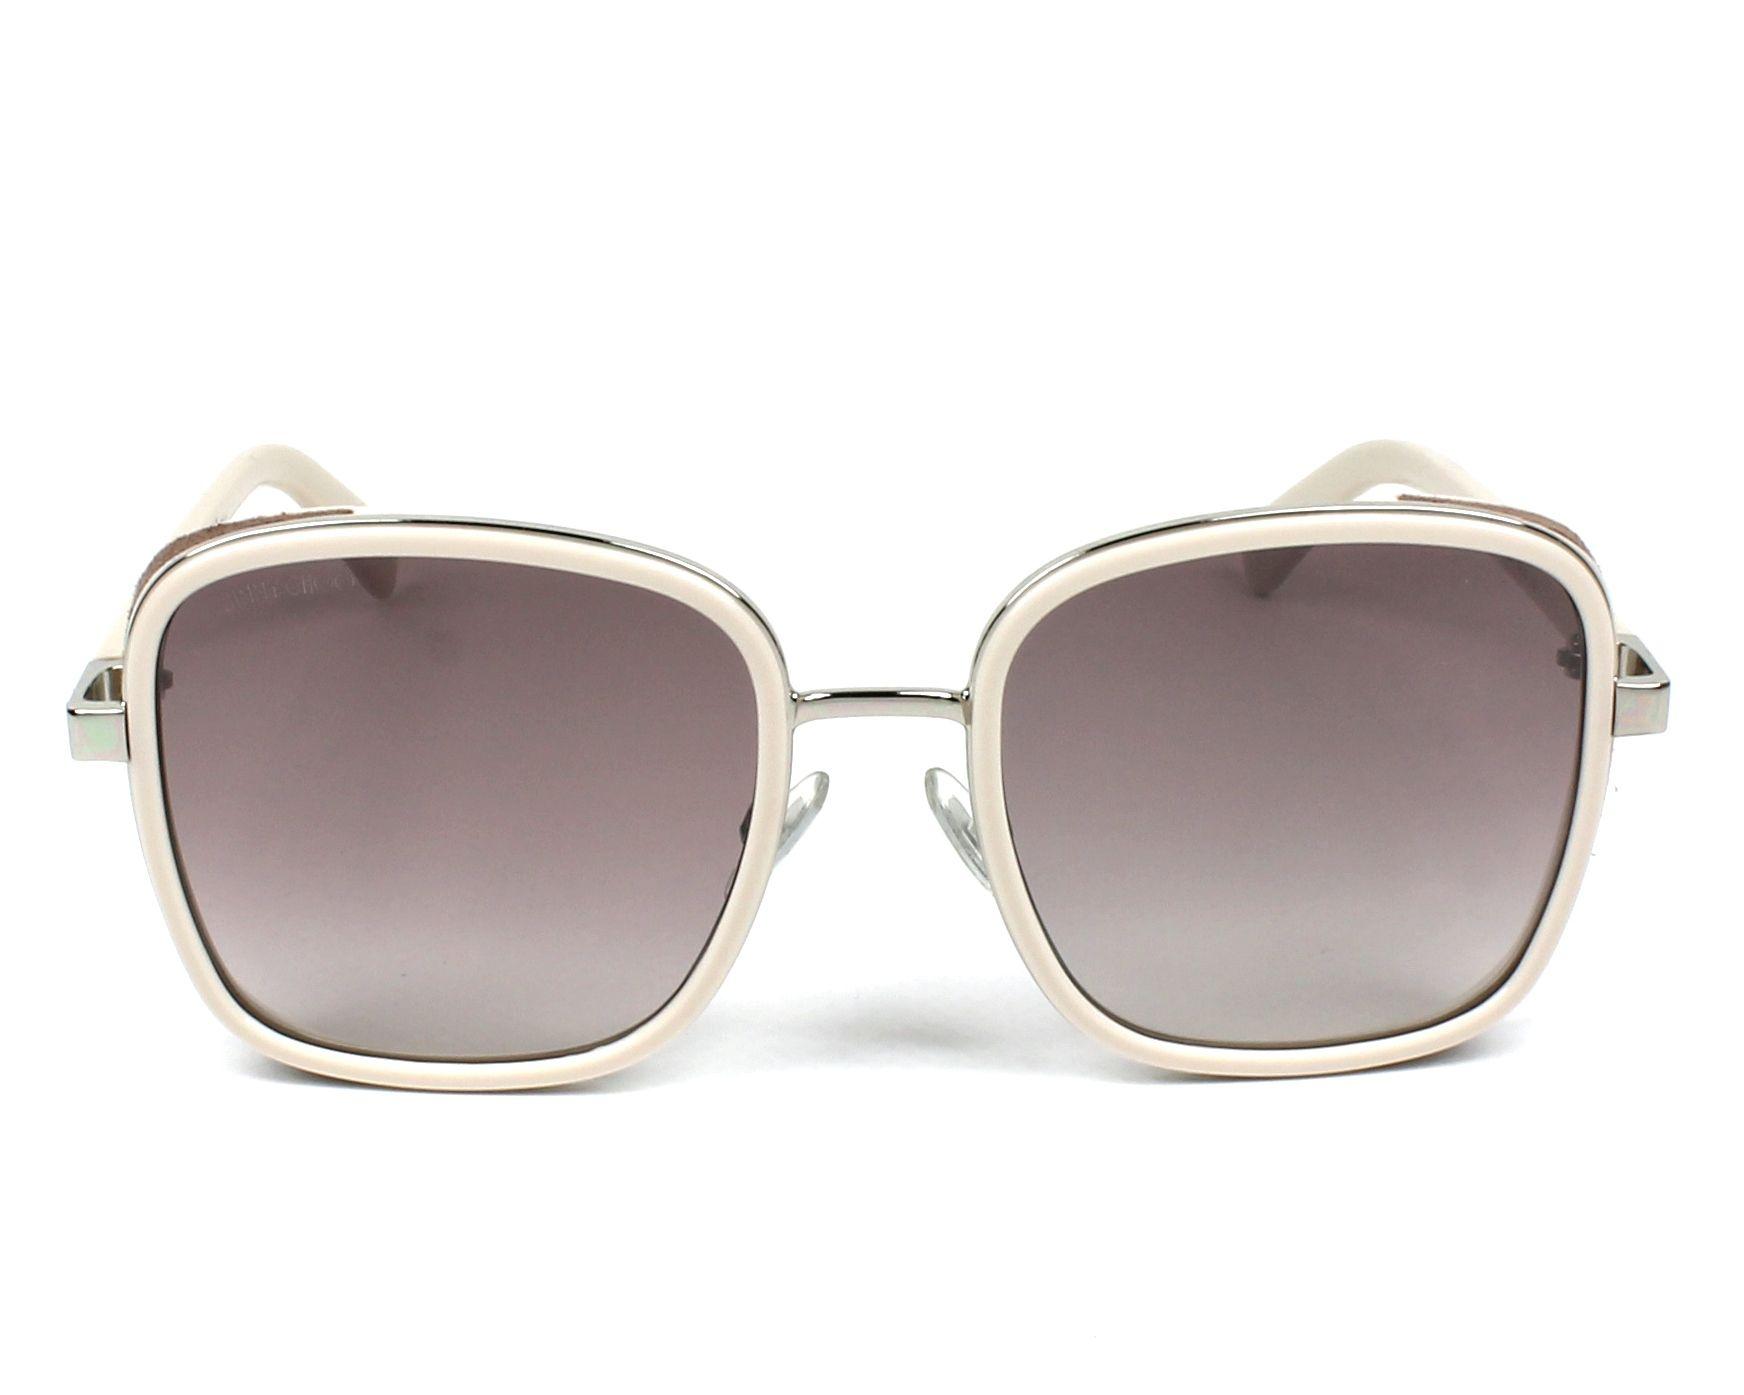 3622a38d428b thumbnail Sunglasses Jimmy Choo ELVA-S 8U0 NQ - Ochre Silver front view